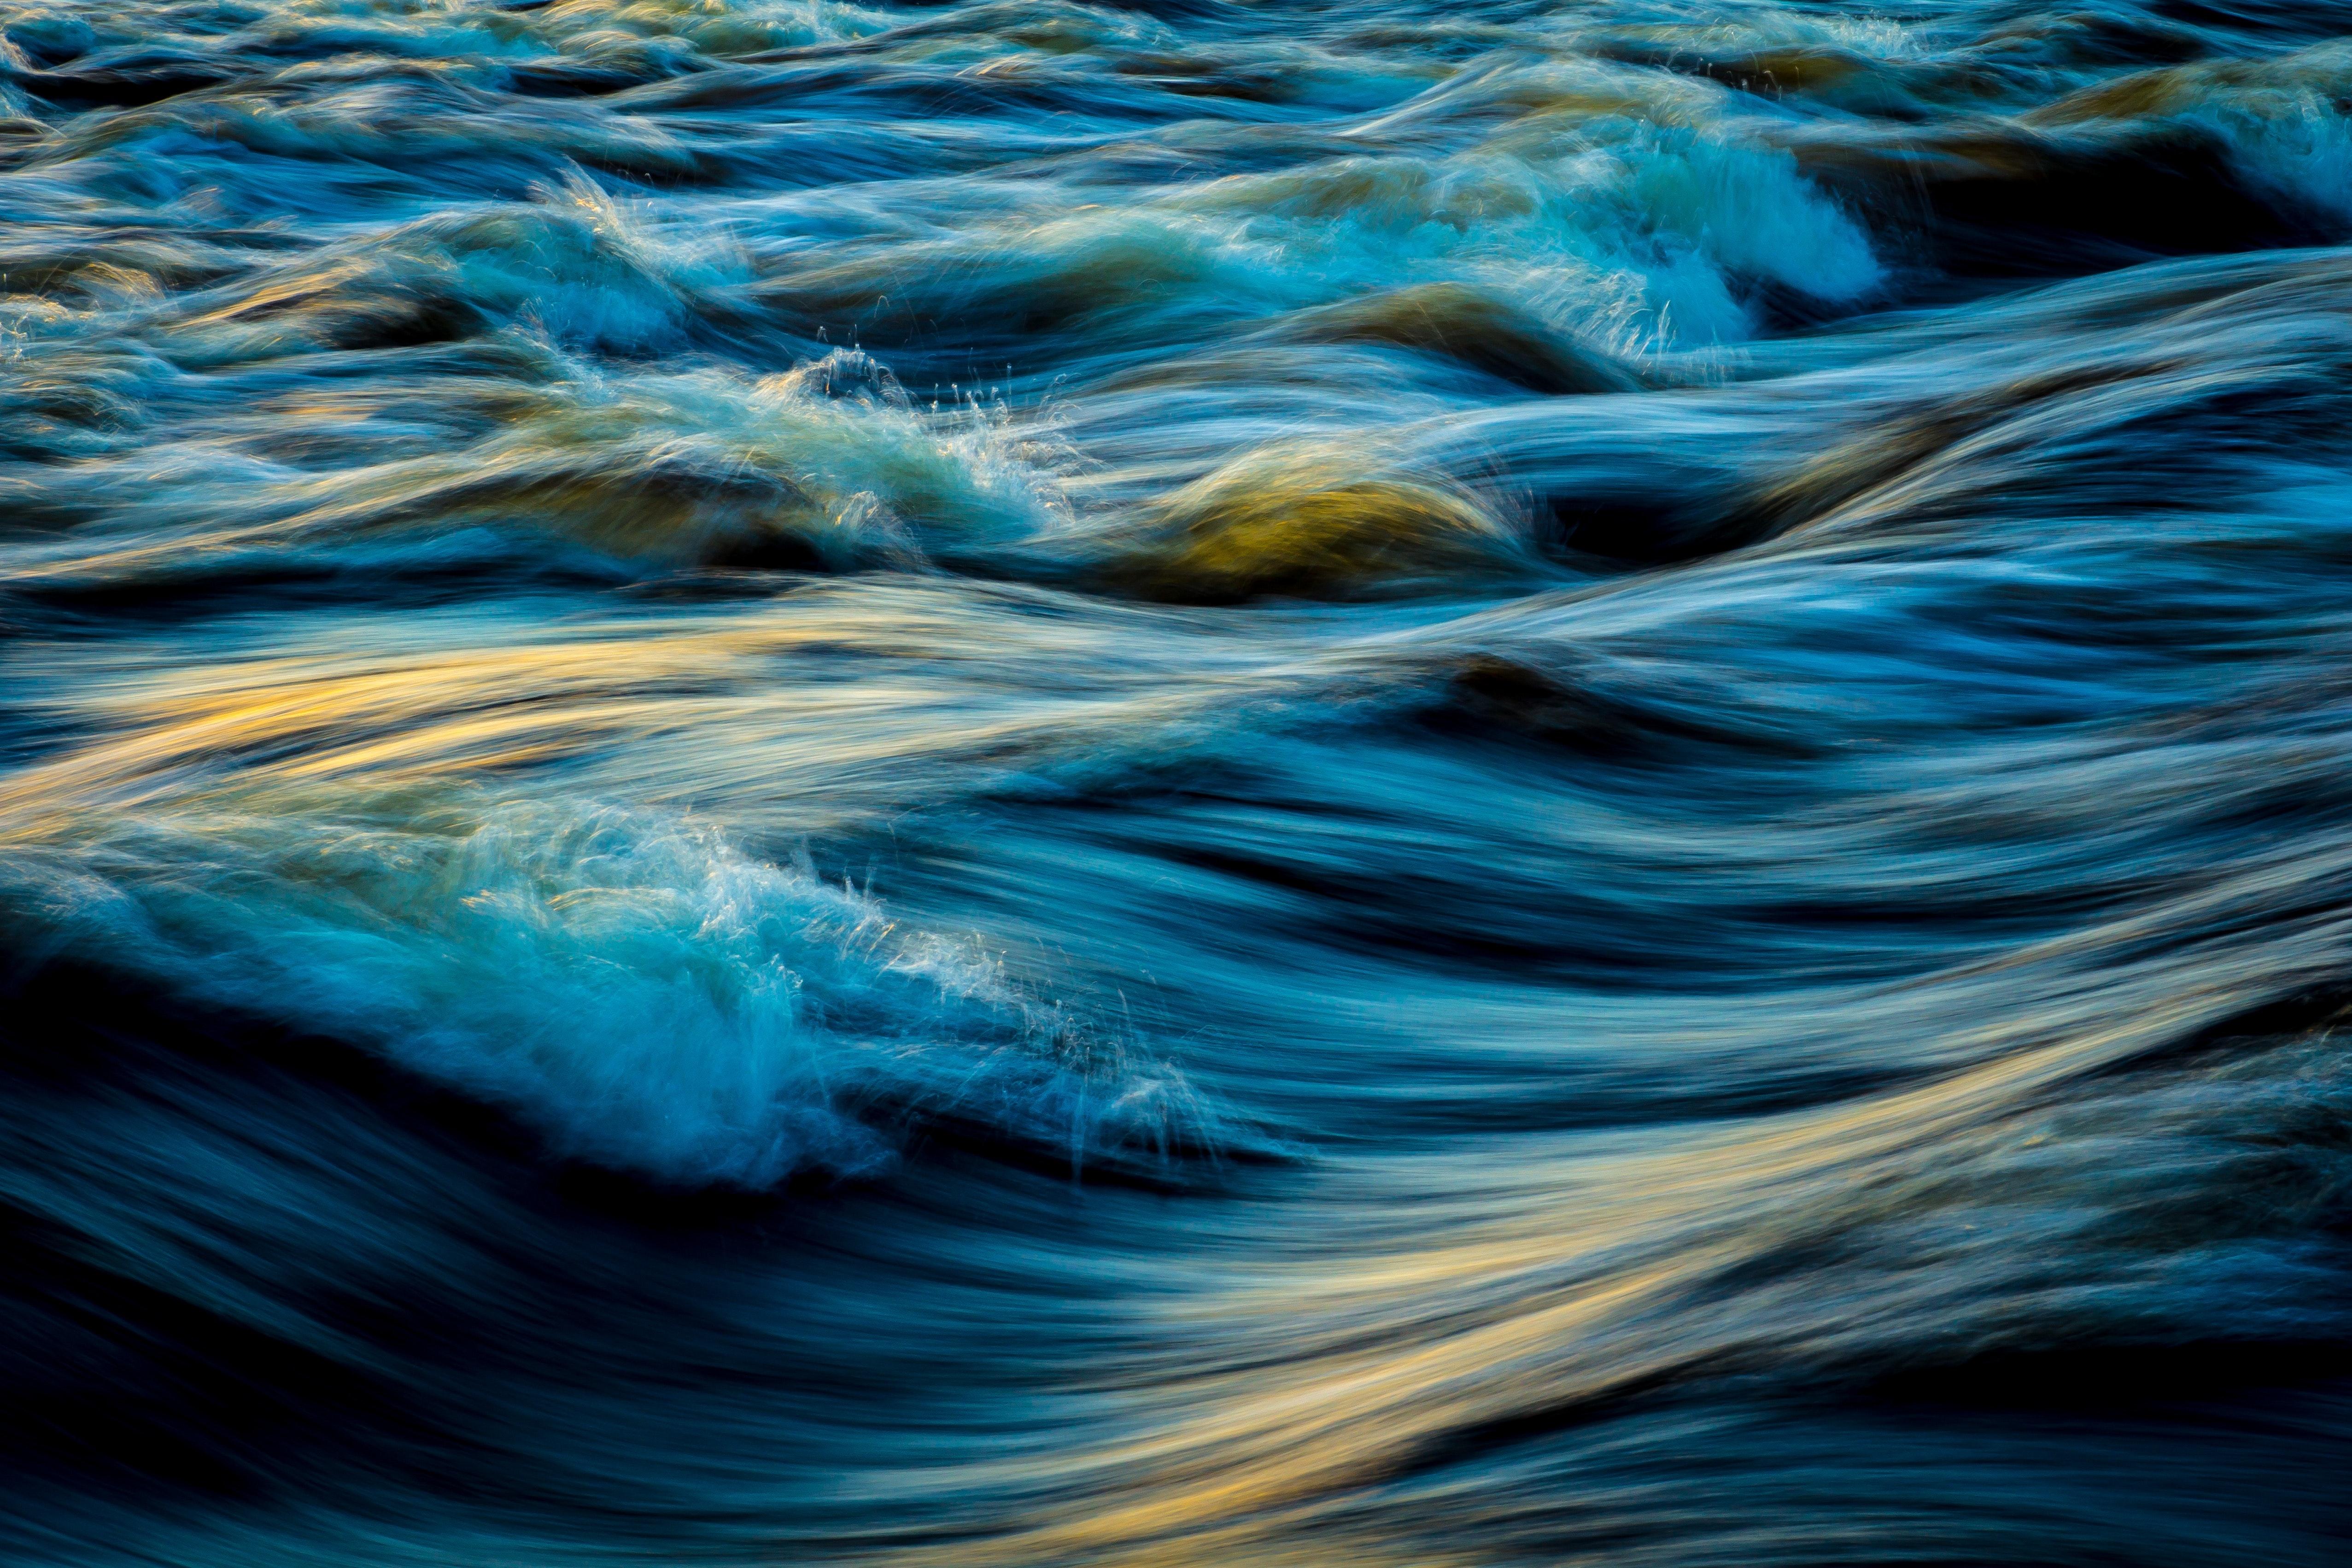 1000+ Amazing Waves Photos · Pexels · Free Stock Photos